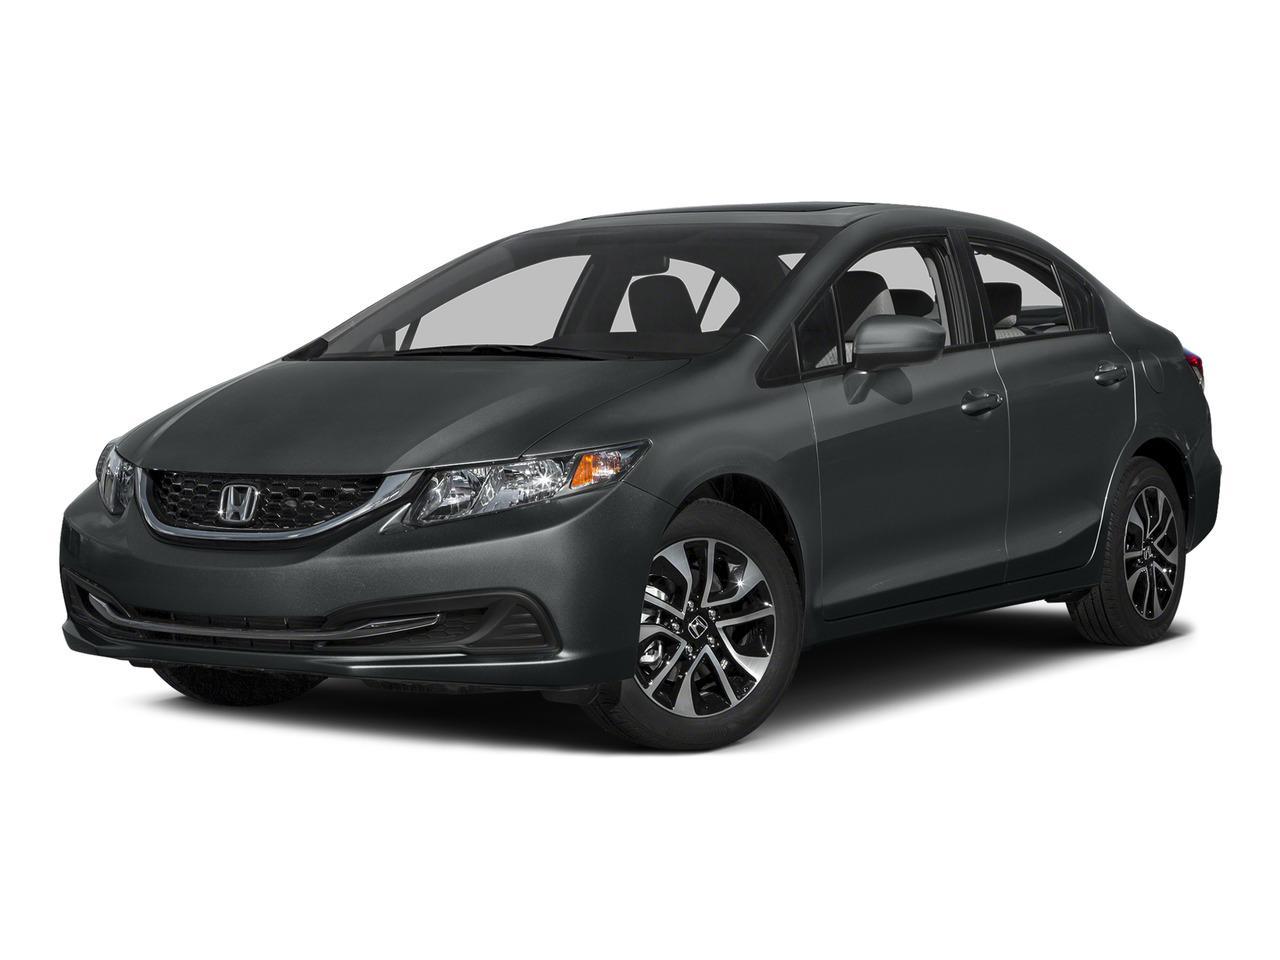 2015 Honda Civic Sedan Vehicle Photo in SELMA, TX 78154-1459